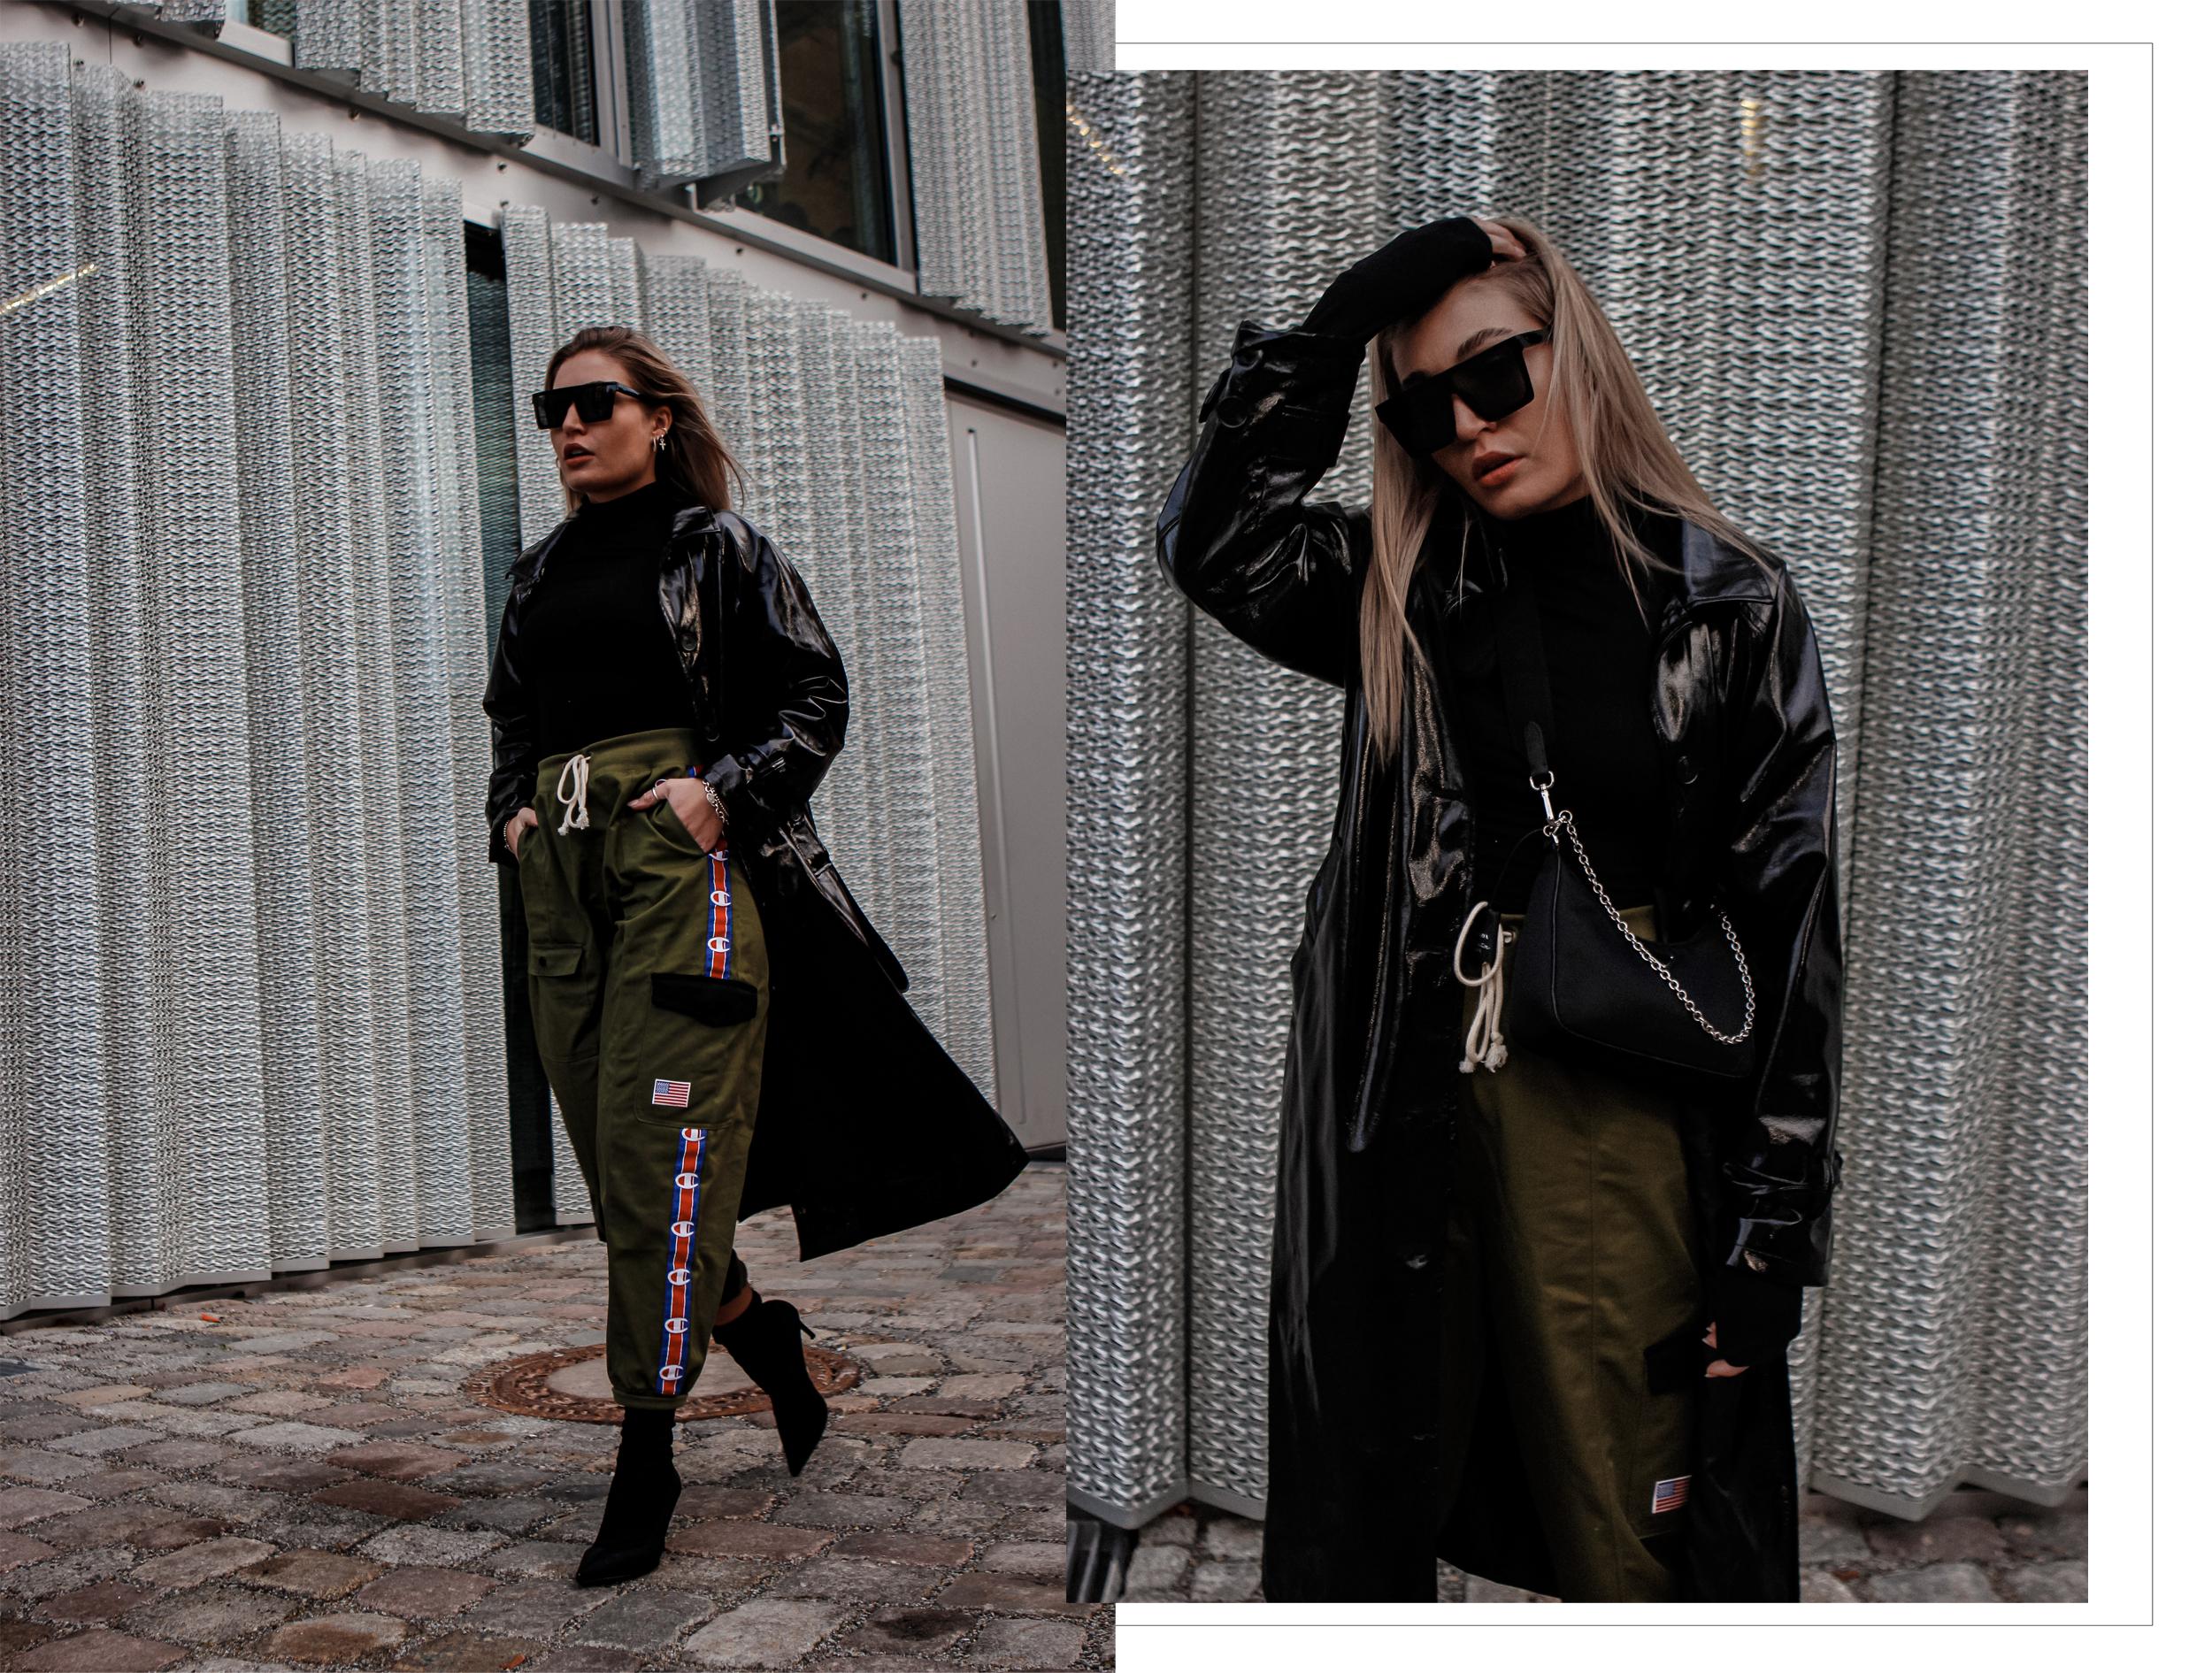 lauralamode-fashion-fashionblogger-streetstyle-style-look-lookoftheday-junkyard-champion-prada-prada multipochette-berlin-fashionblogger-munich